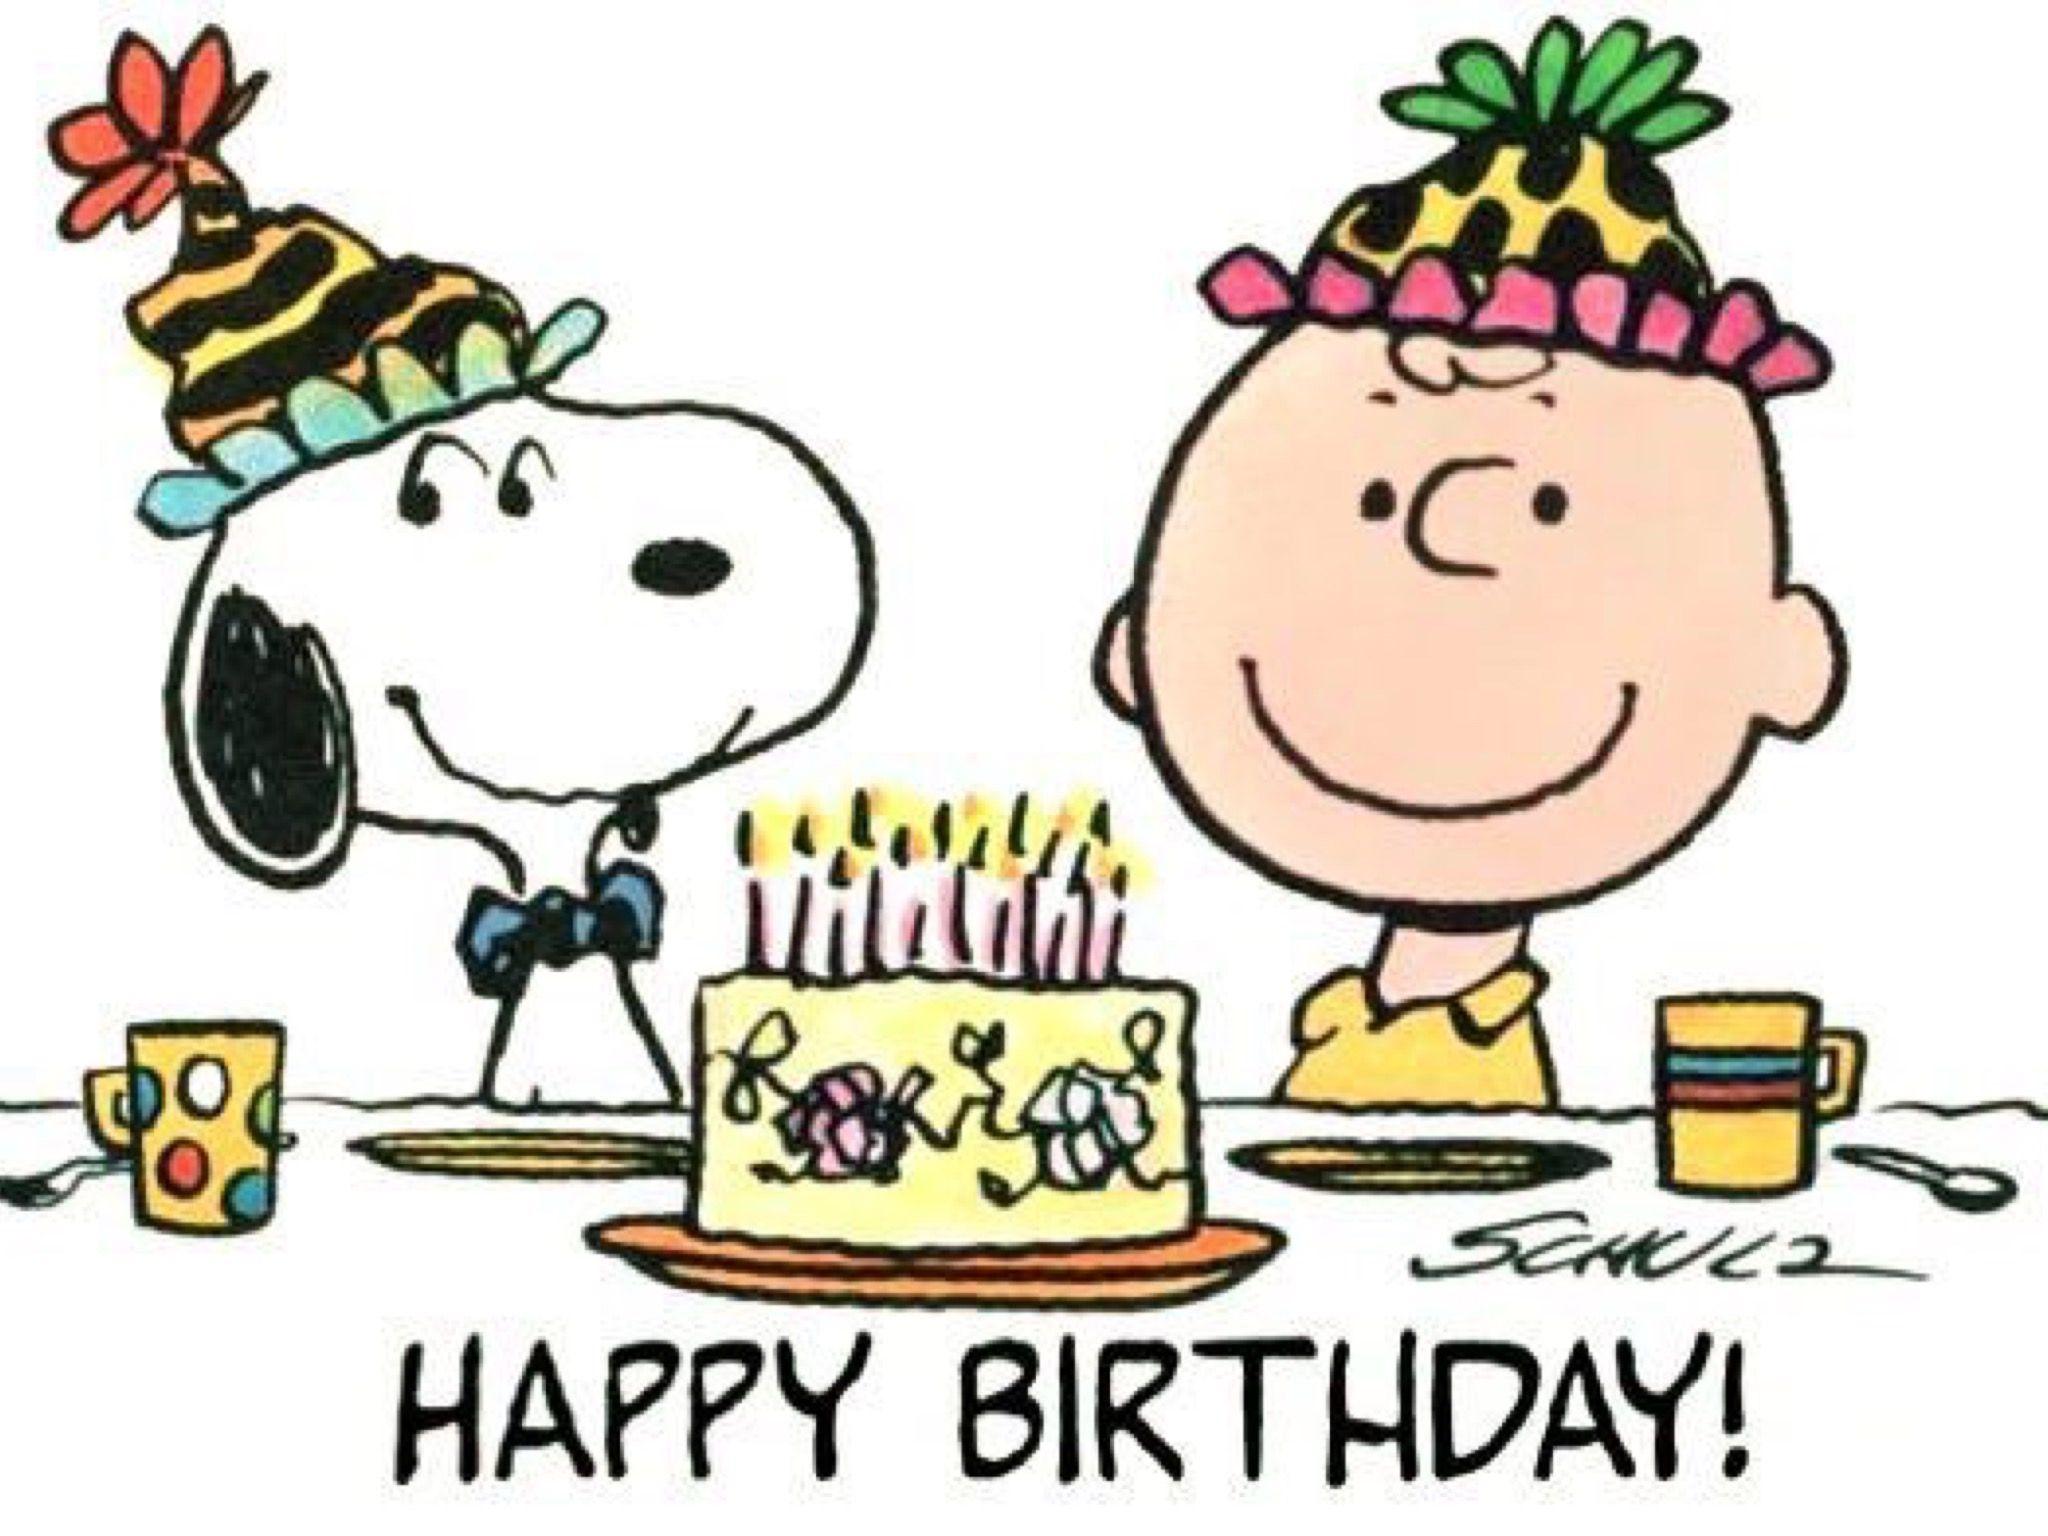 2048x1536 Snoopy Cliparts Congratulations Free Download Clip Art